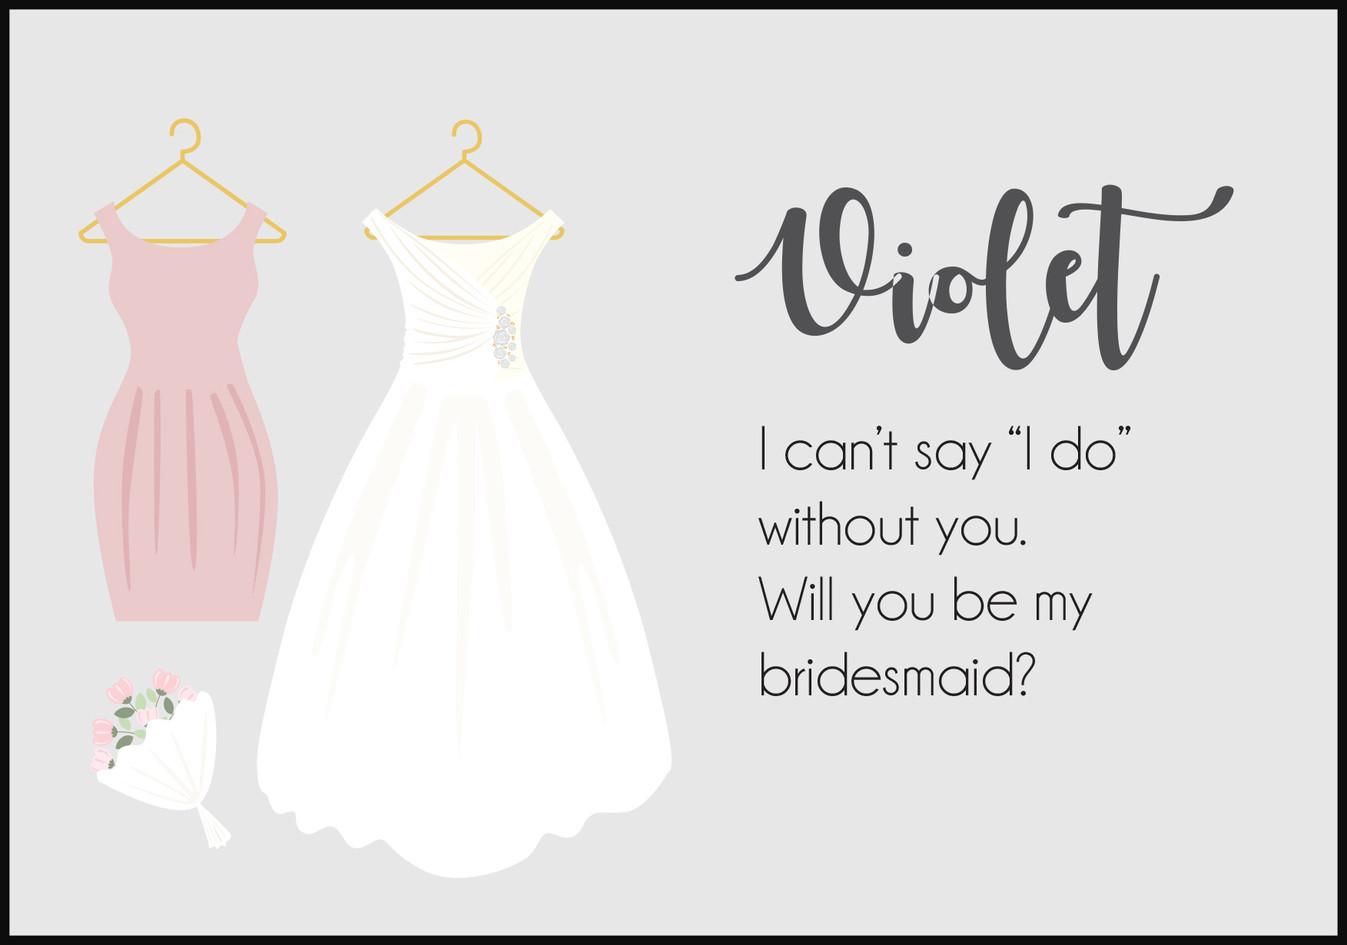 New bridesmaid card 20201.jpg